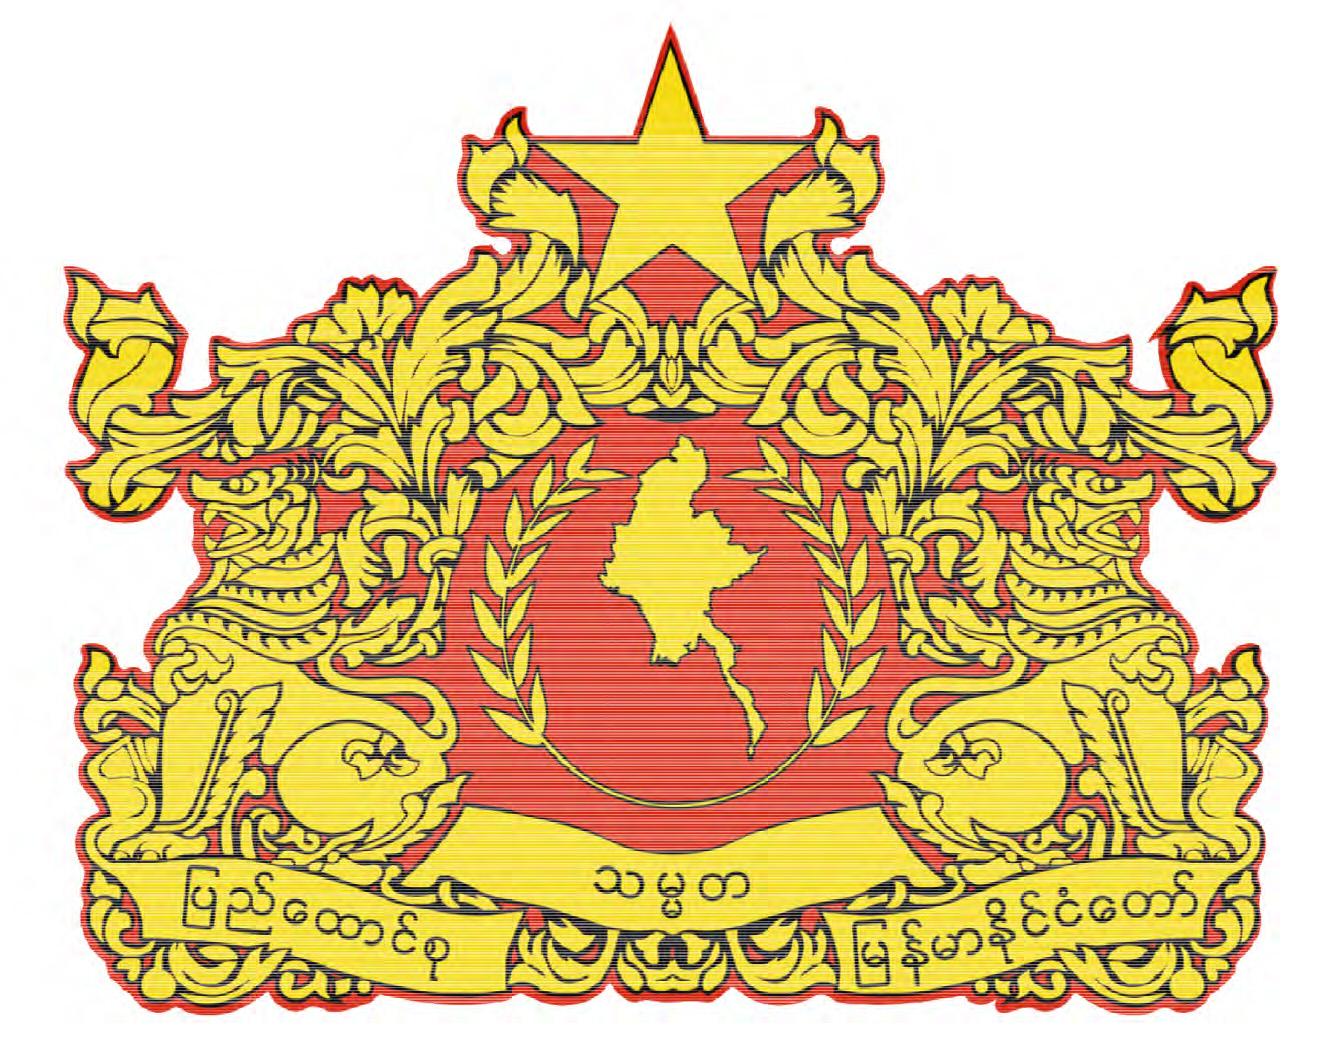 STATE SEAL OF MYANMAR